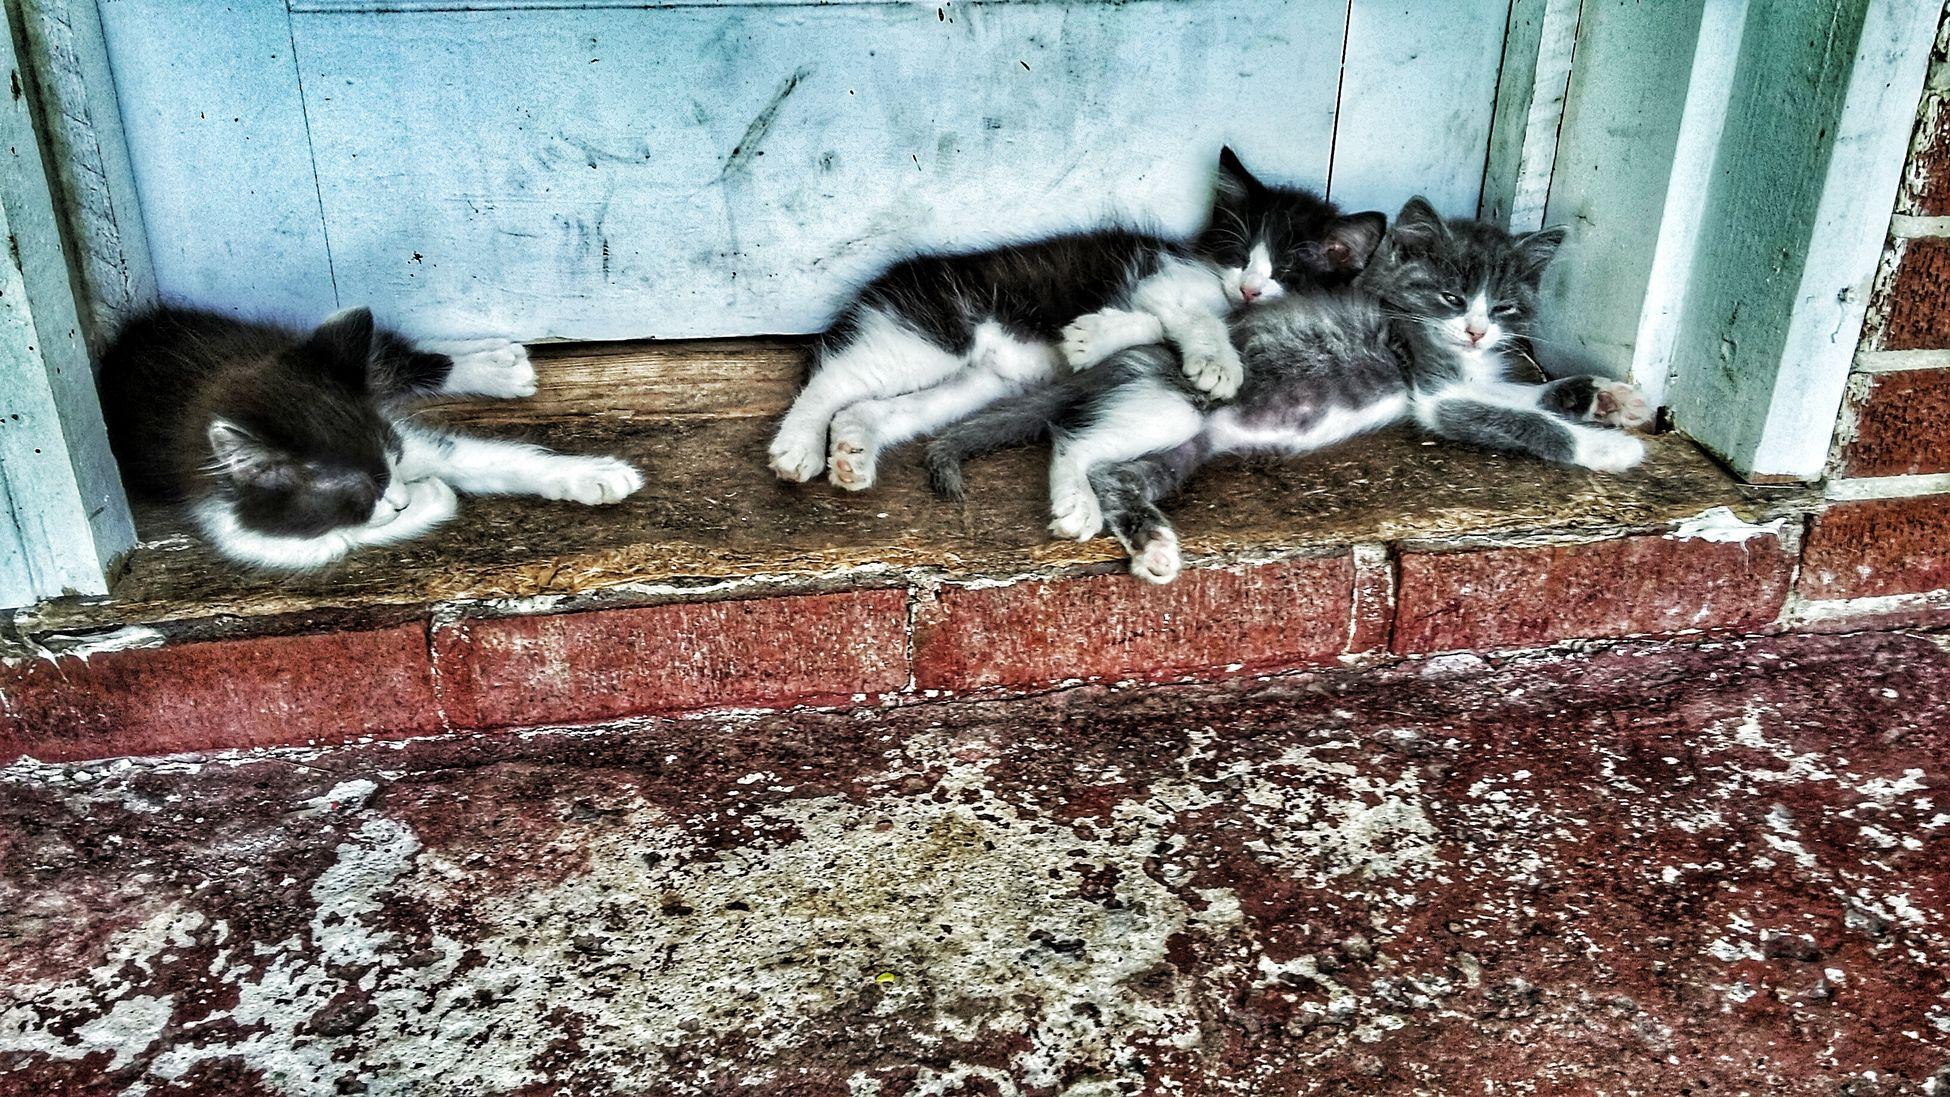 Sleepy Kittens Animallovers County House Random Photo Time Taking Photos EmmieC